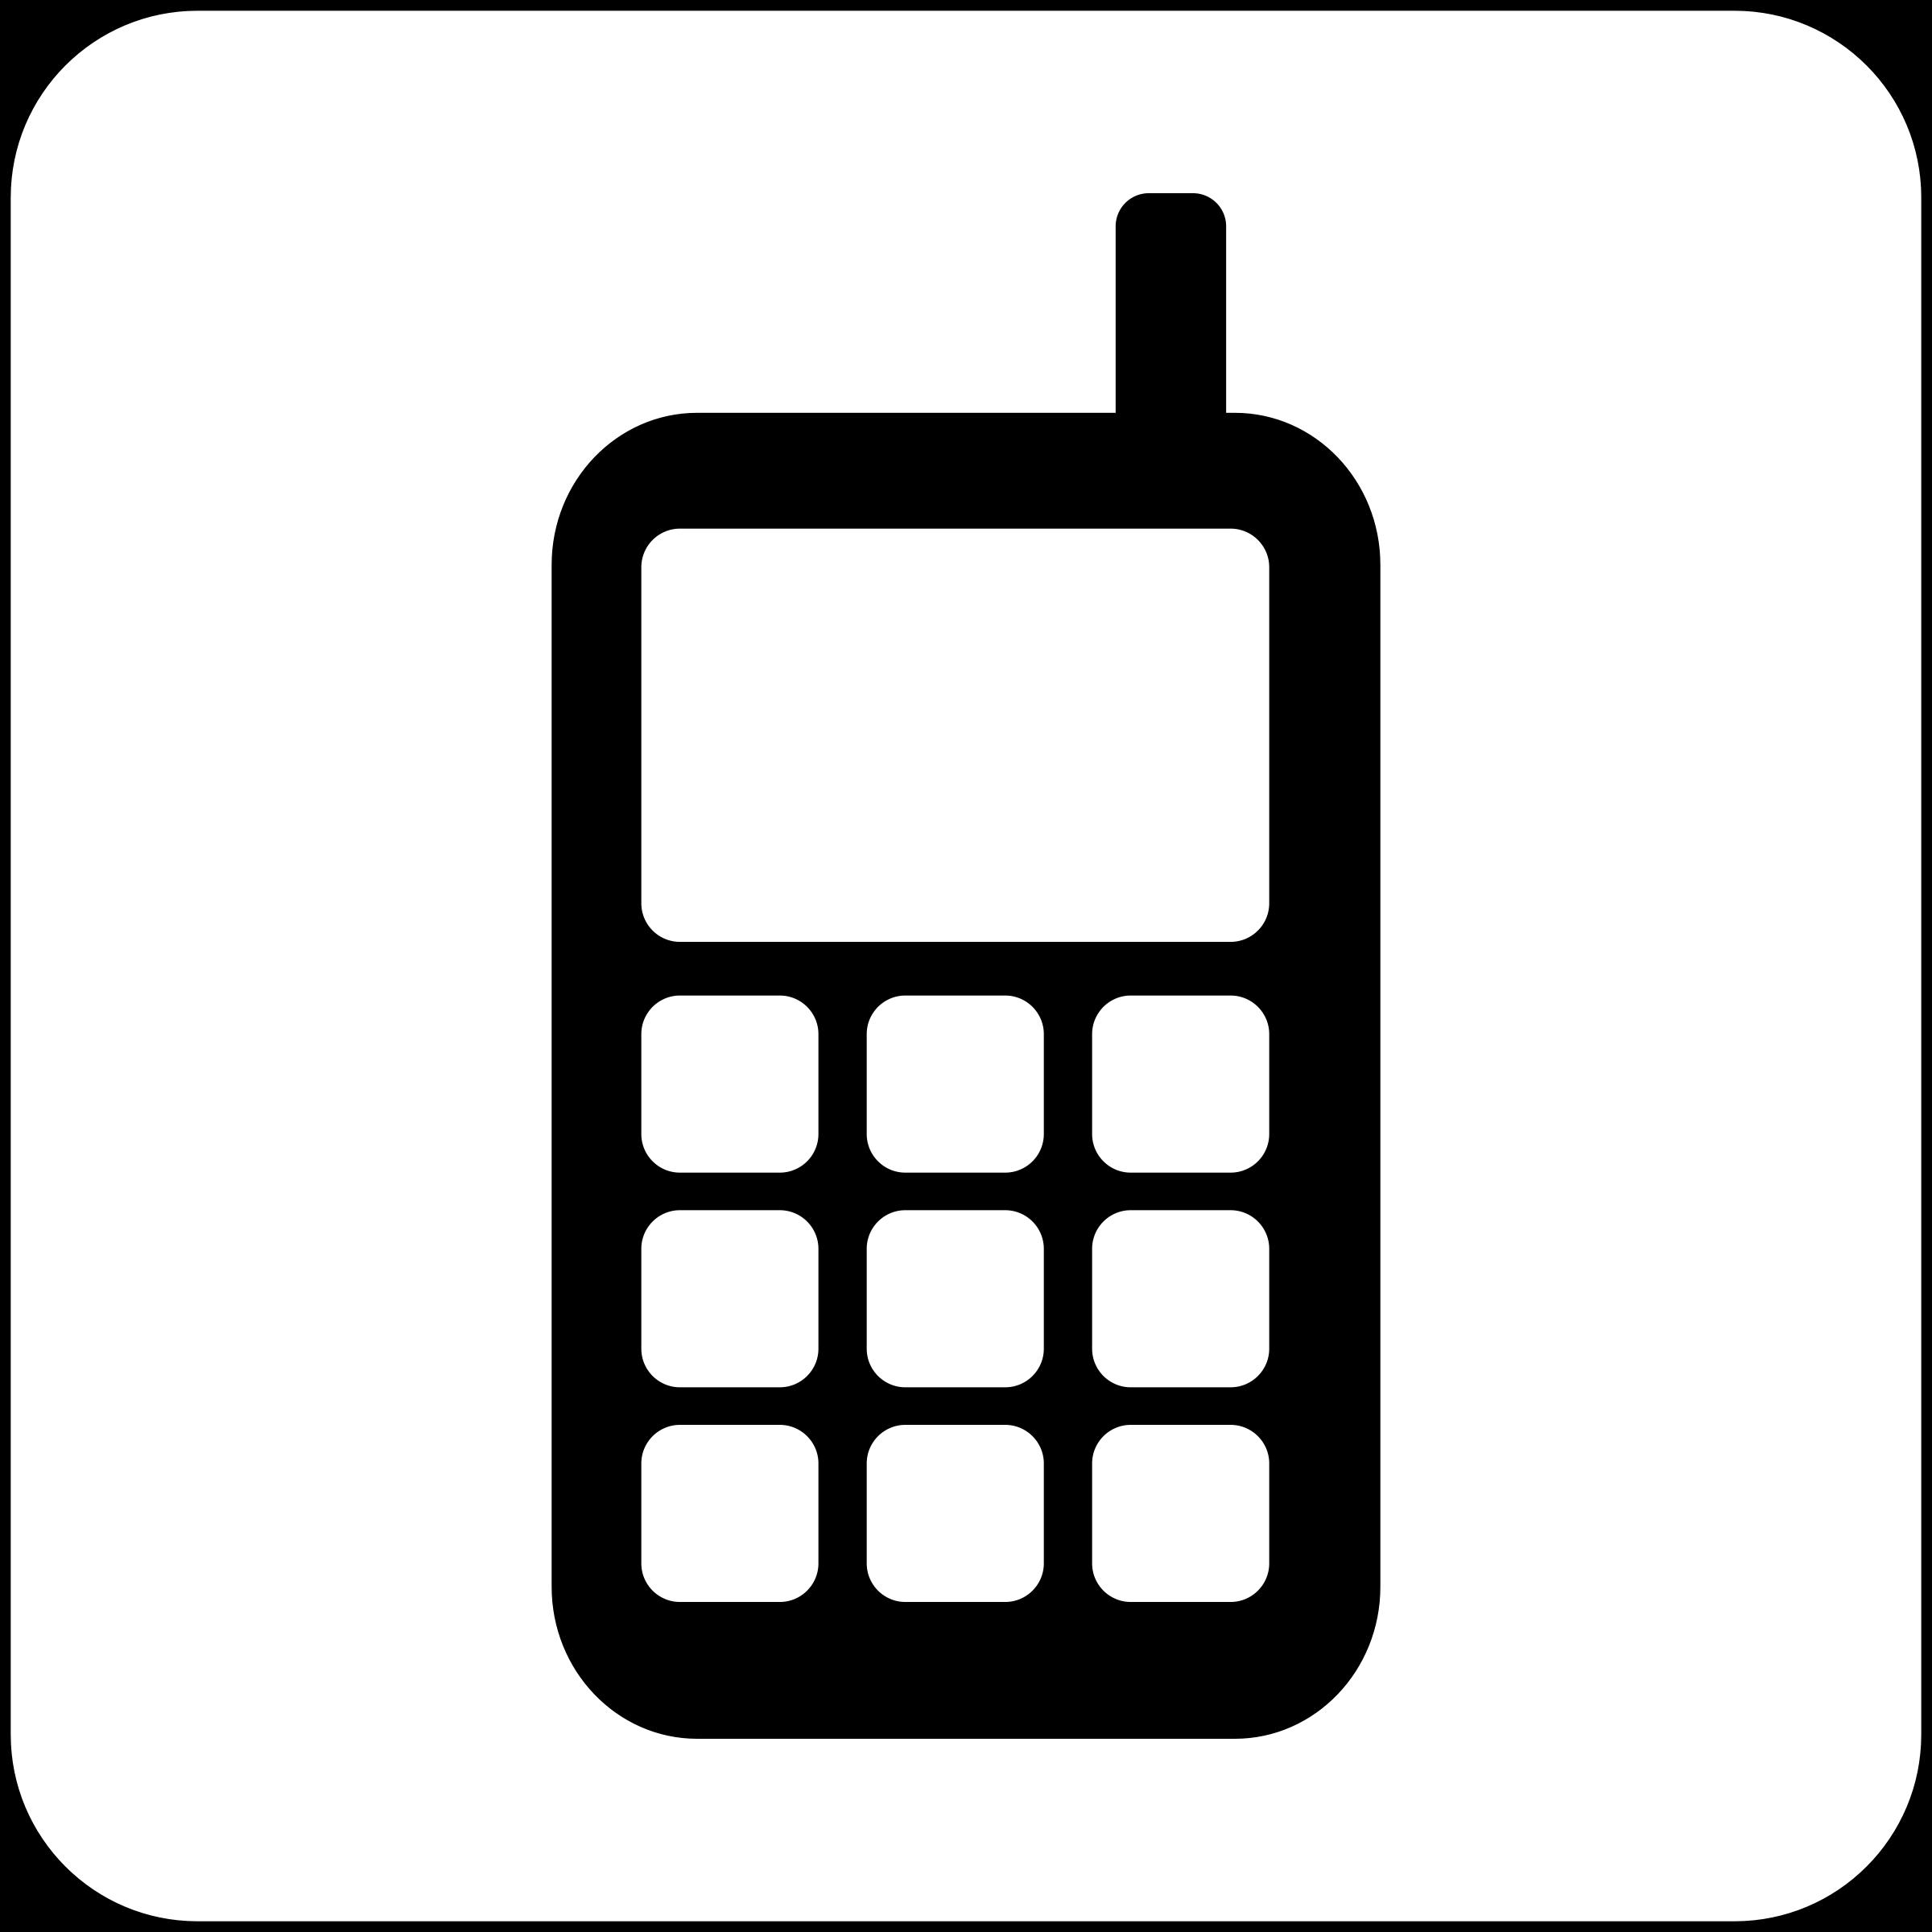 2400x2400 Big Cellphone Icon Vector Clipart Image